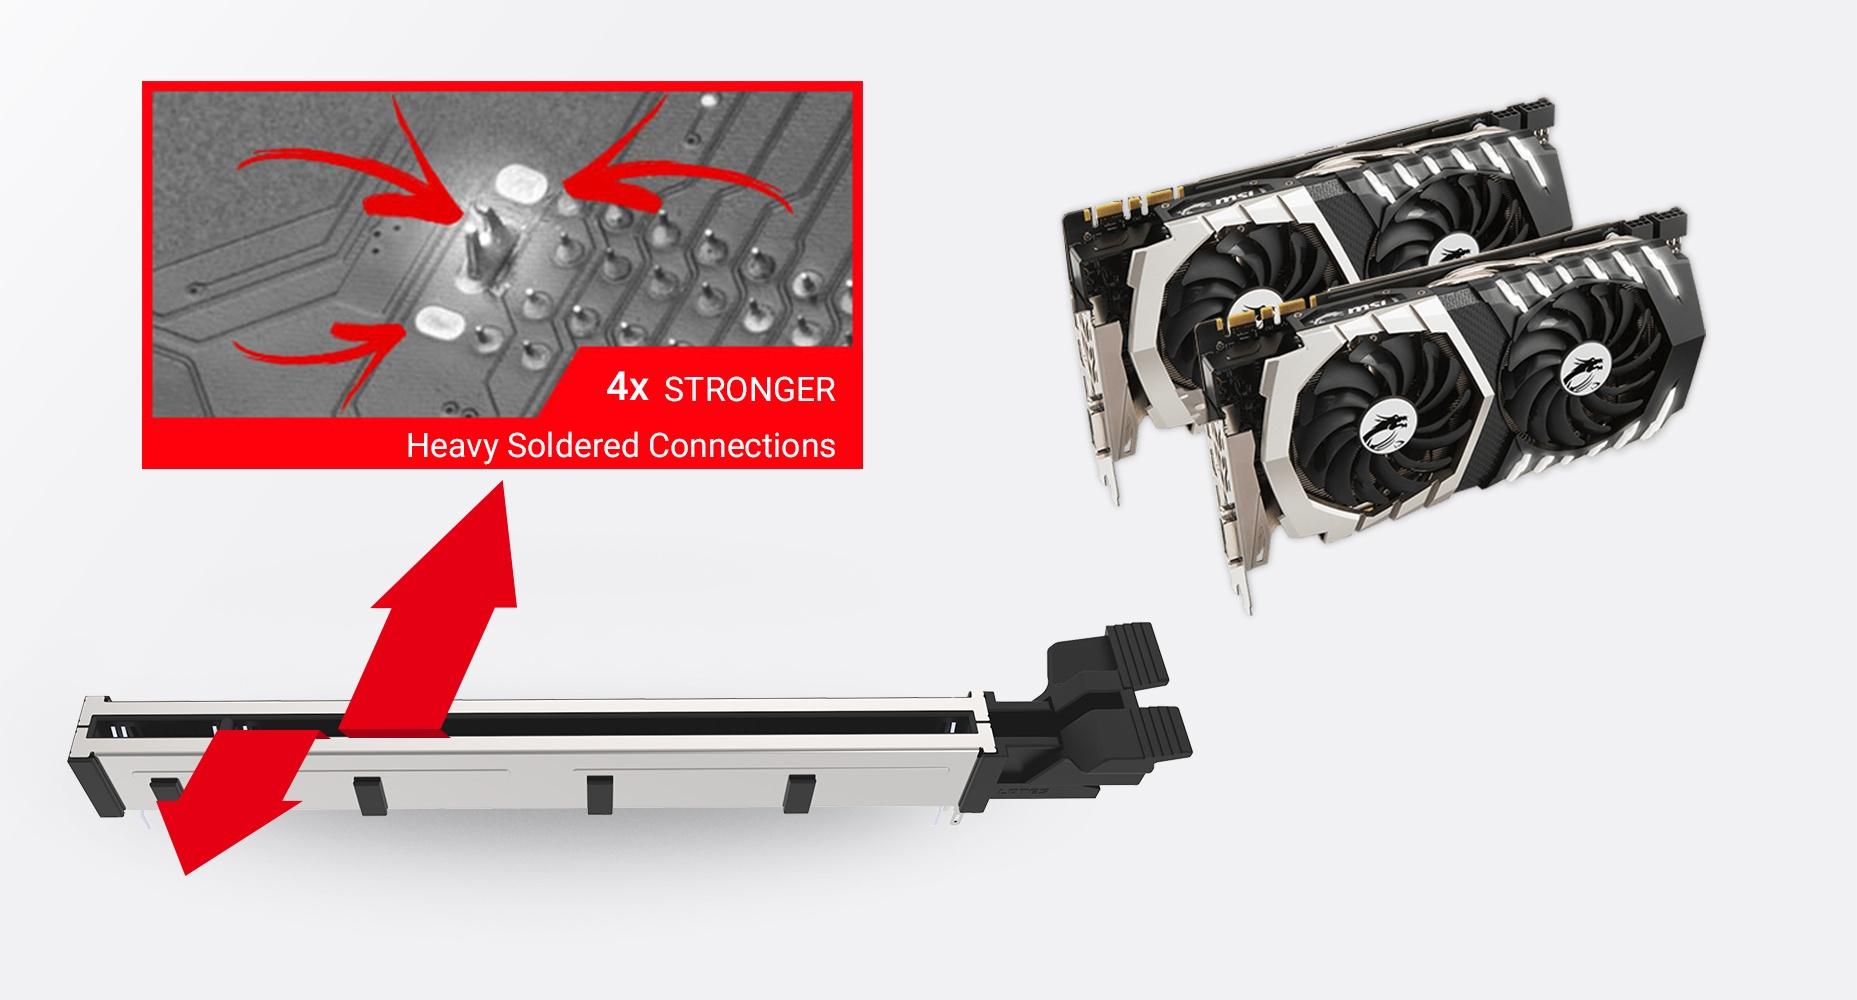 MSI MAG B460 TORPEDO MULTIPLE GPU SUPPORTS AND STEEL ARMOR